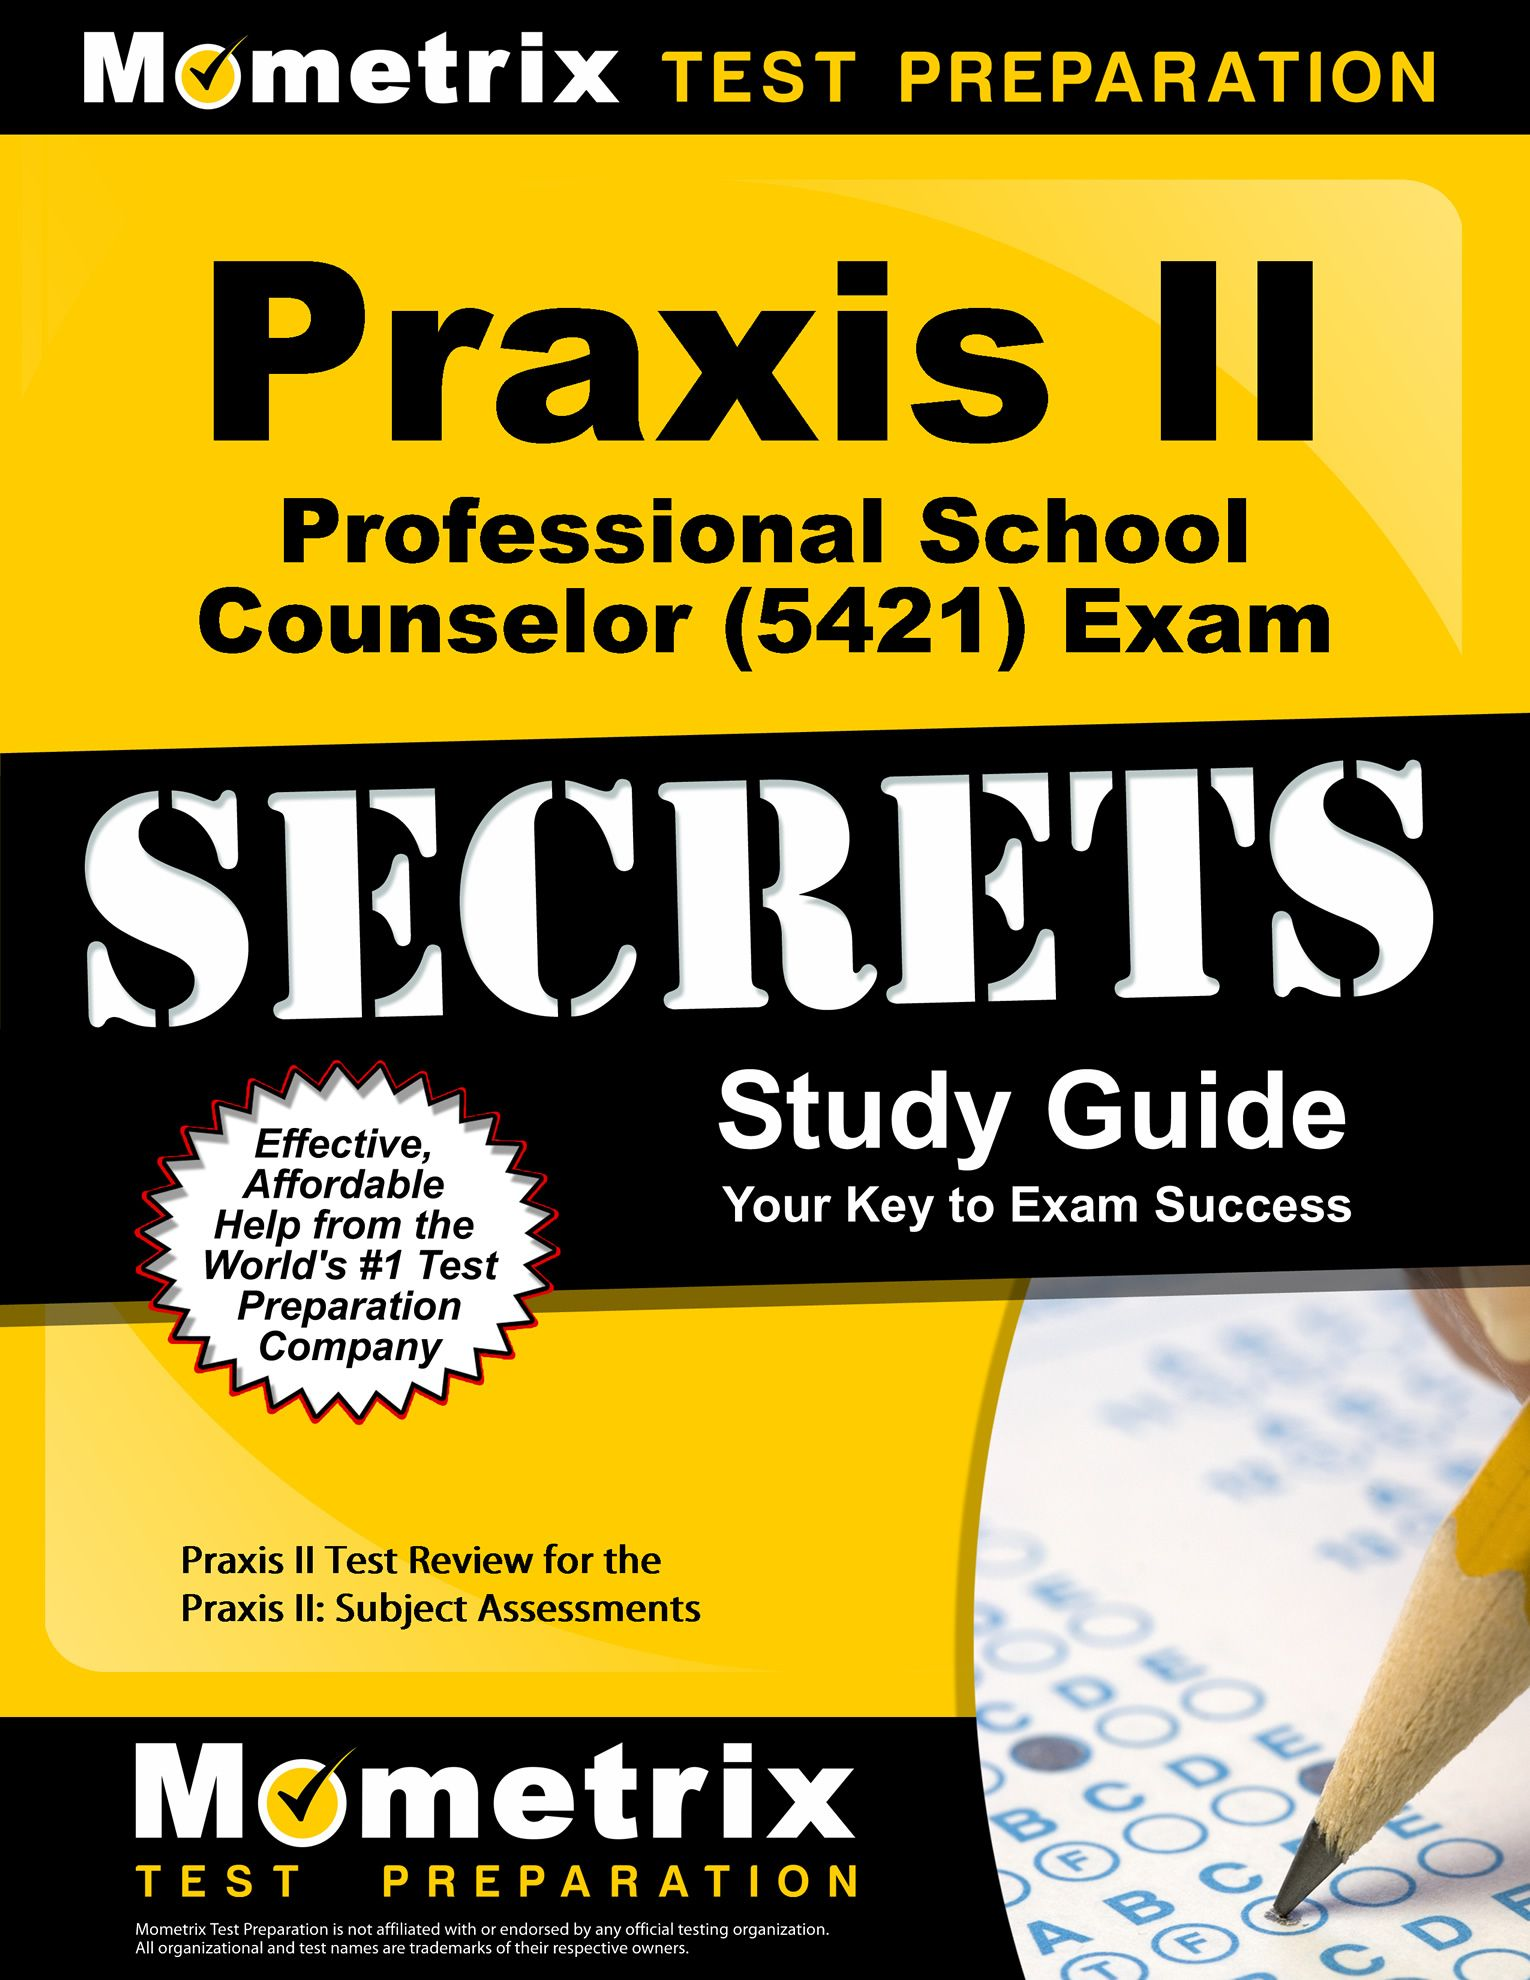 Pin On Praxis Ii Study Guide